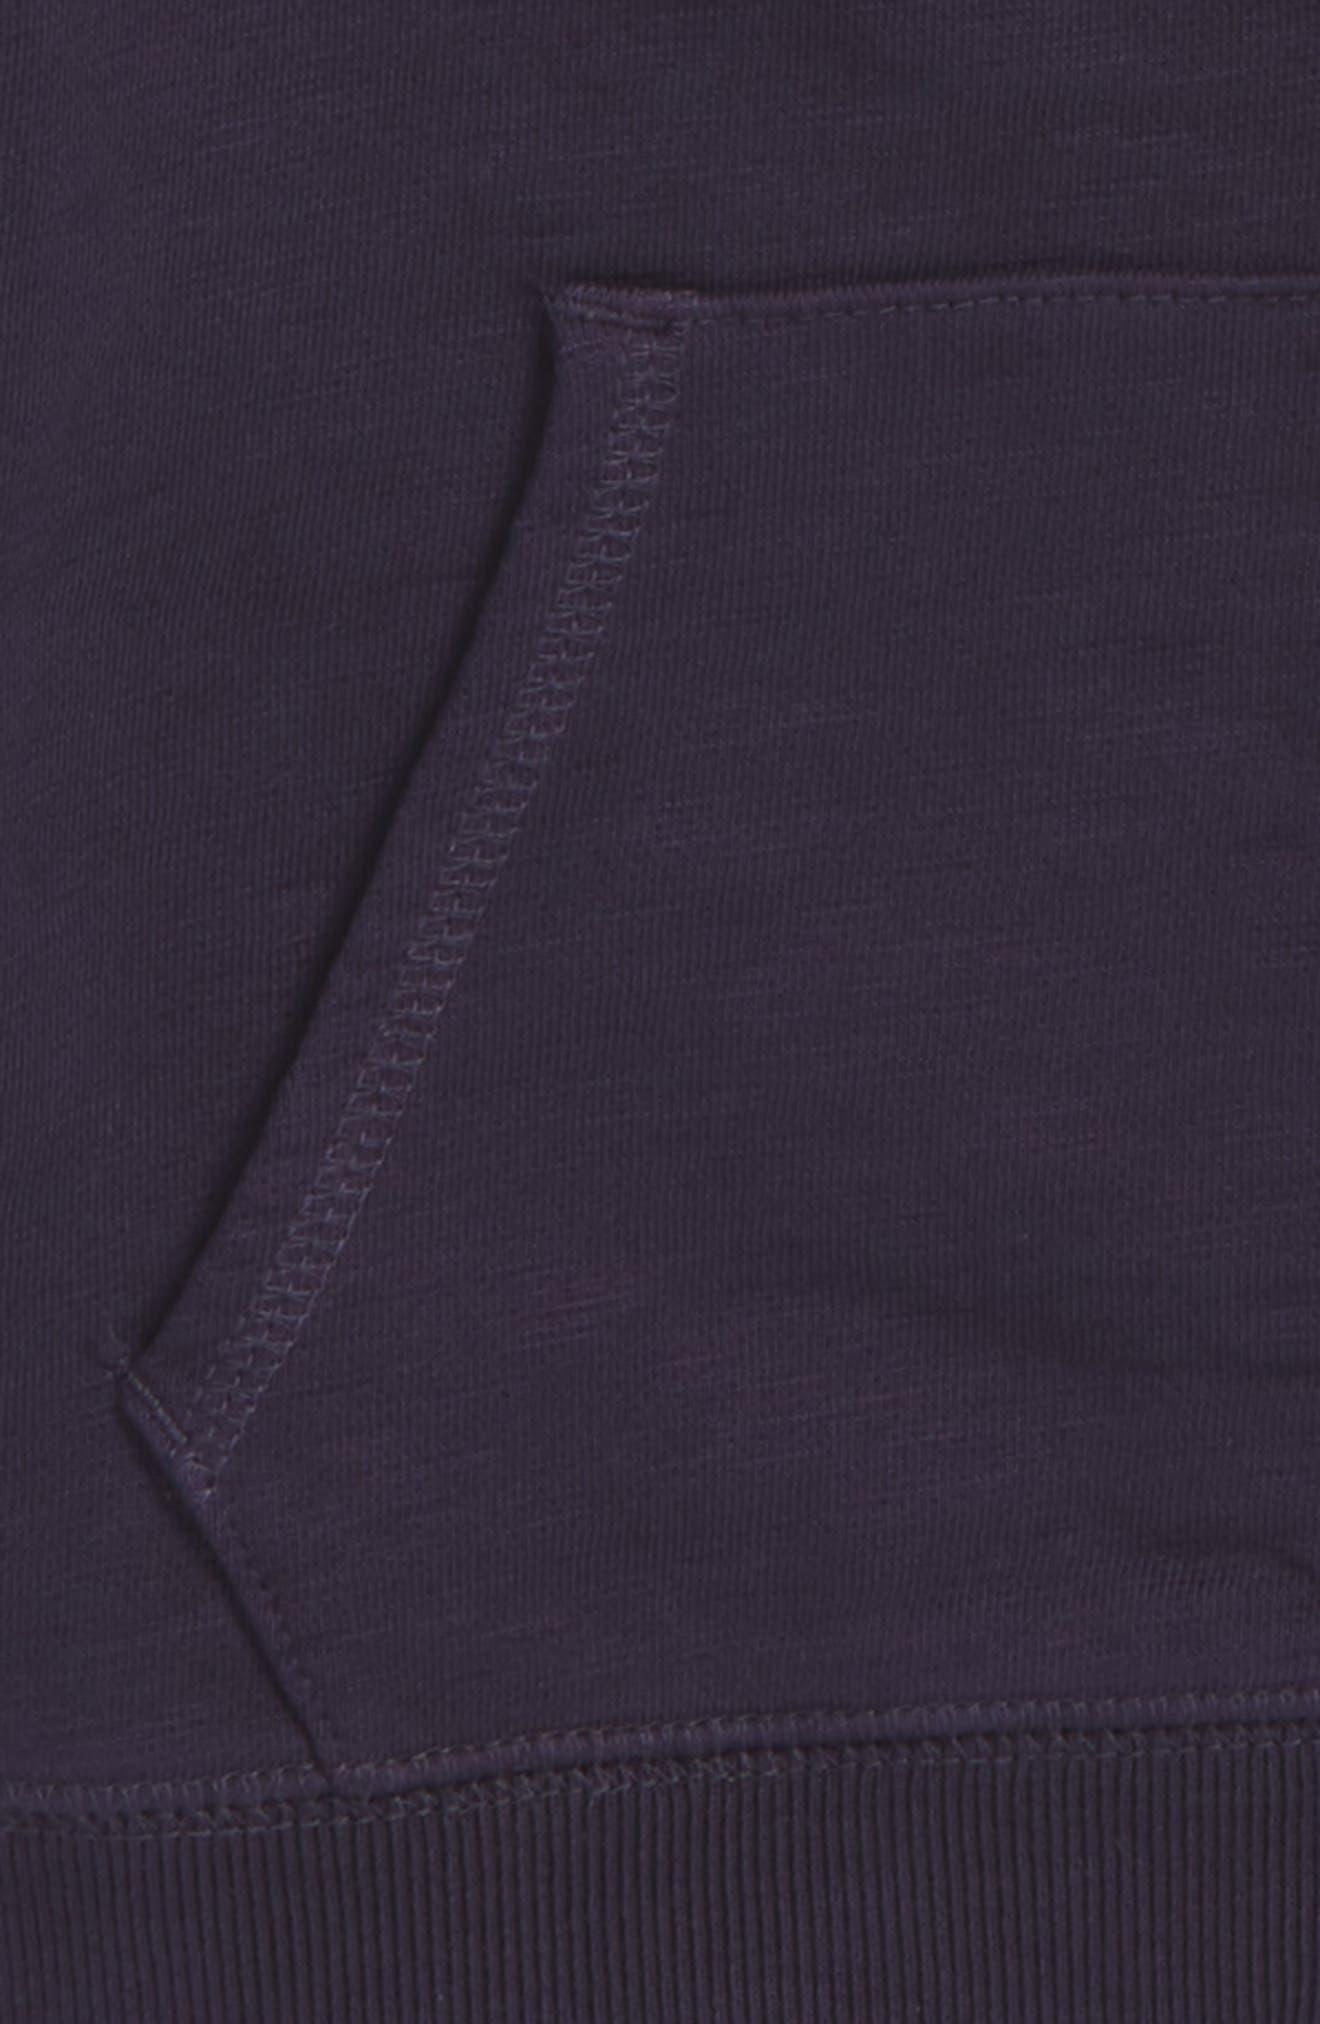 Full Zip Hoodie,                             Alternate thumbnail 2, color,                             Ultra Marine Blue